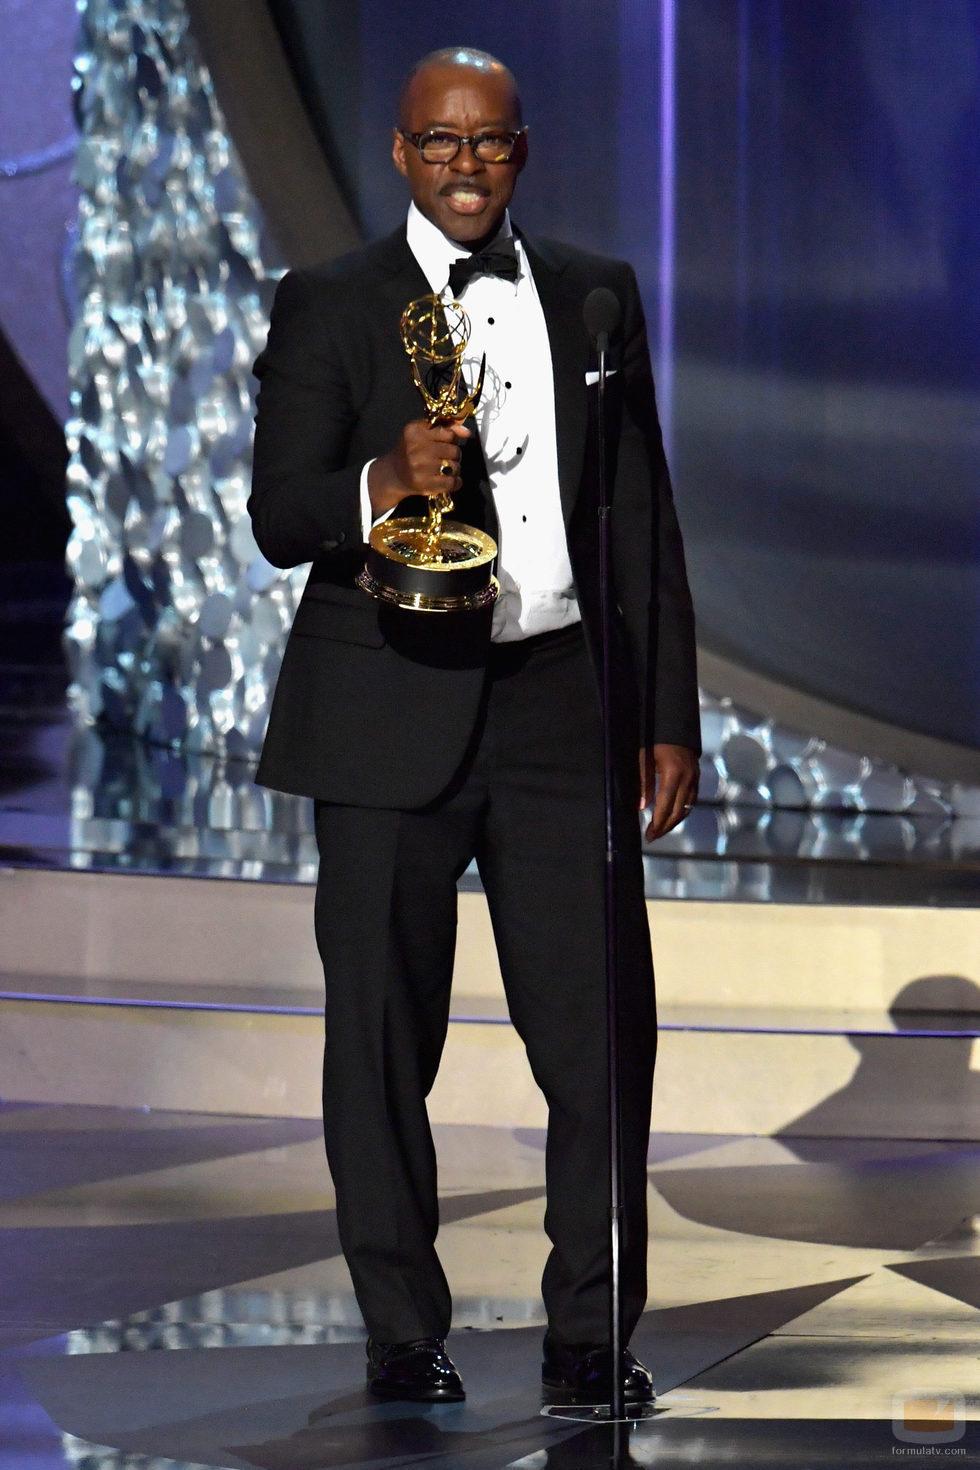 Courtney B. Vance recogiendo su Premio Emmy 2016